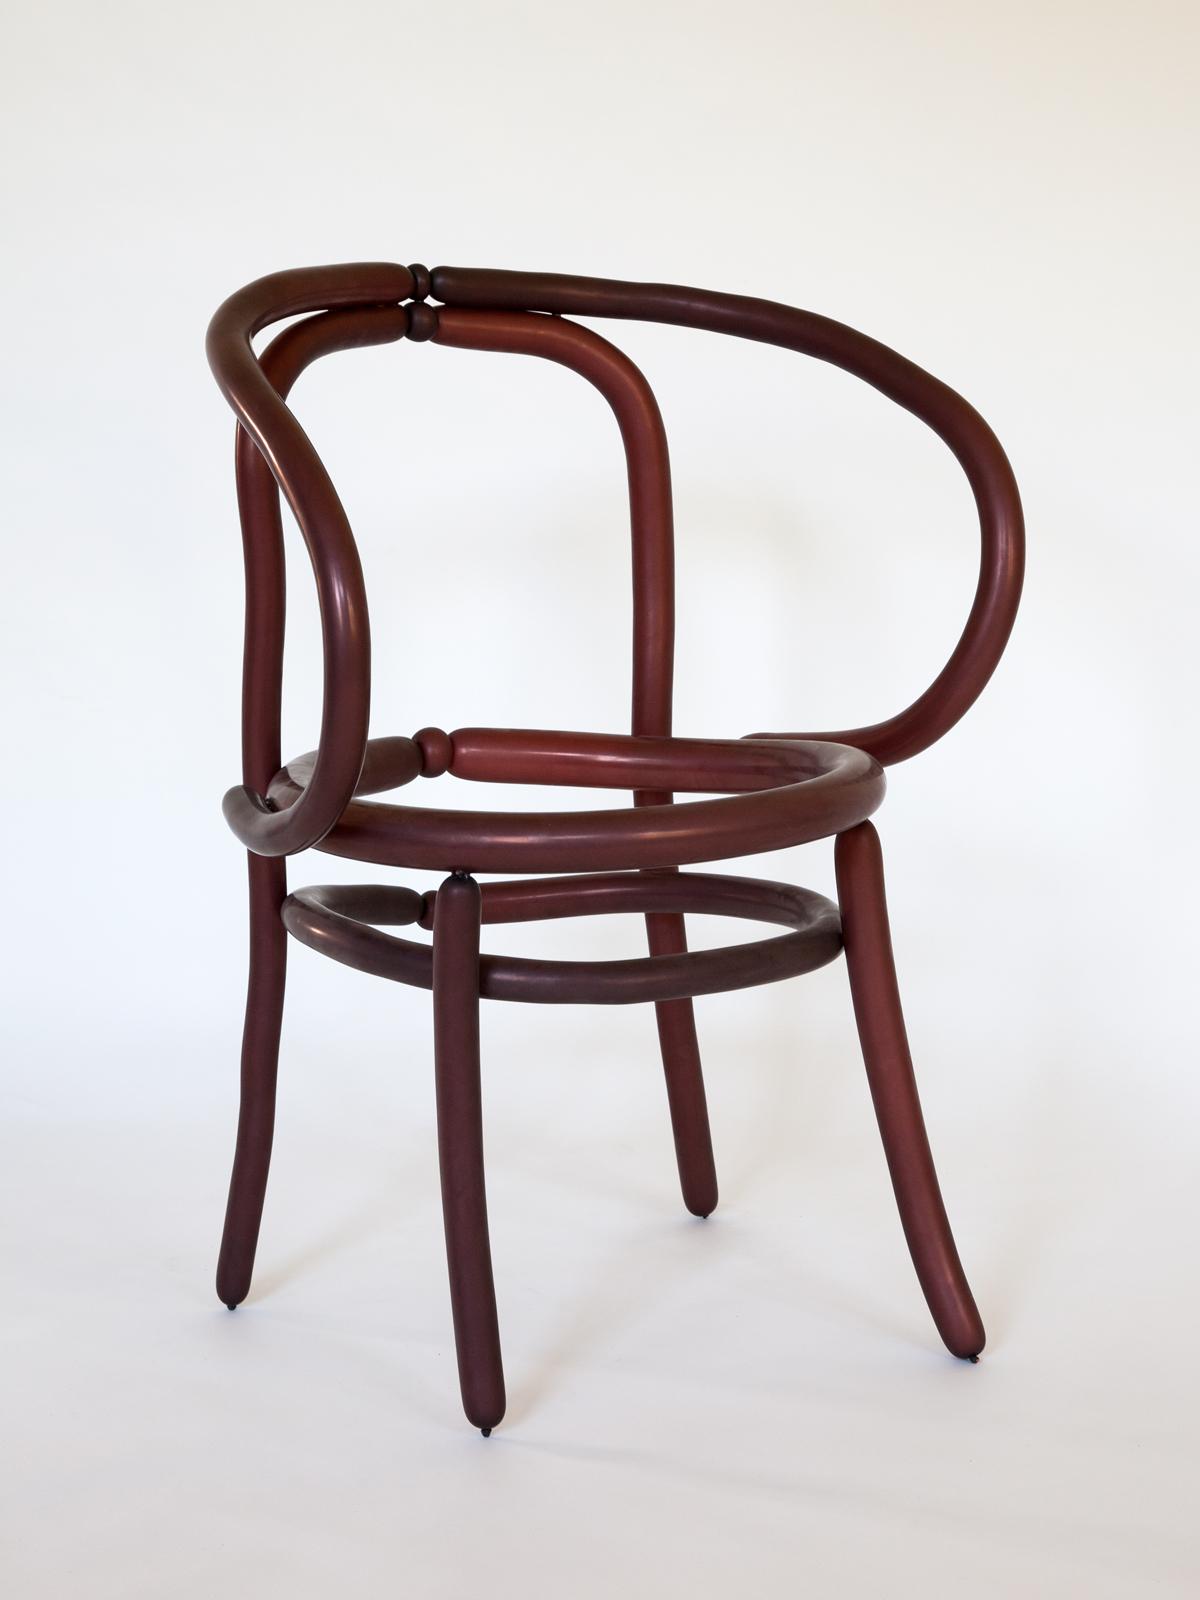 chairs hester oerlemans. Black Bedroom Furniture Sets. Home Design Ideas